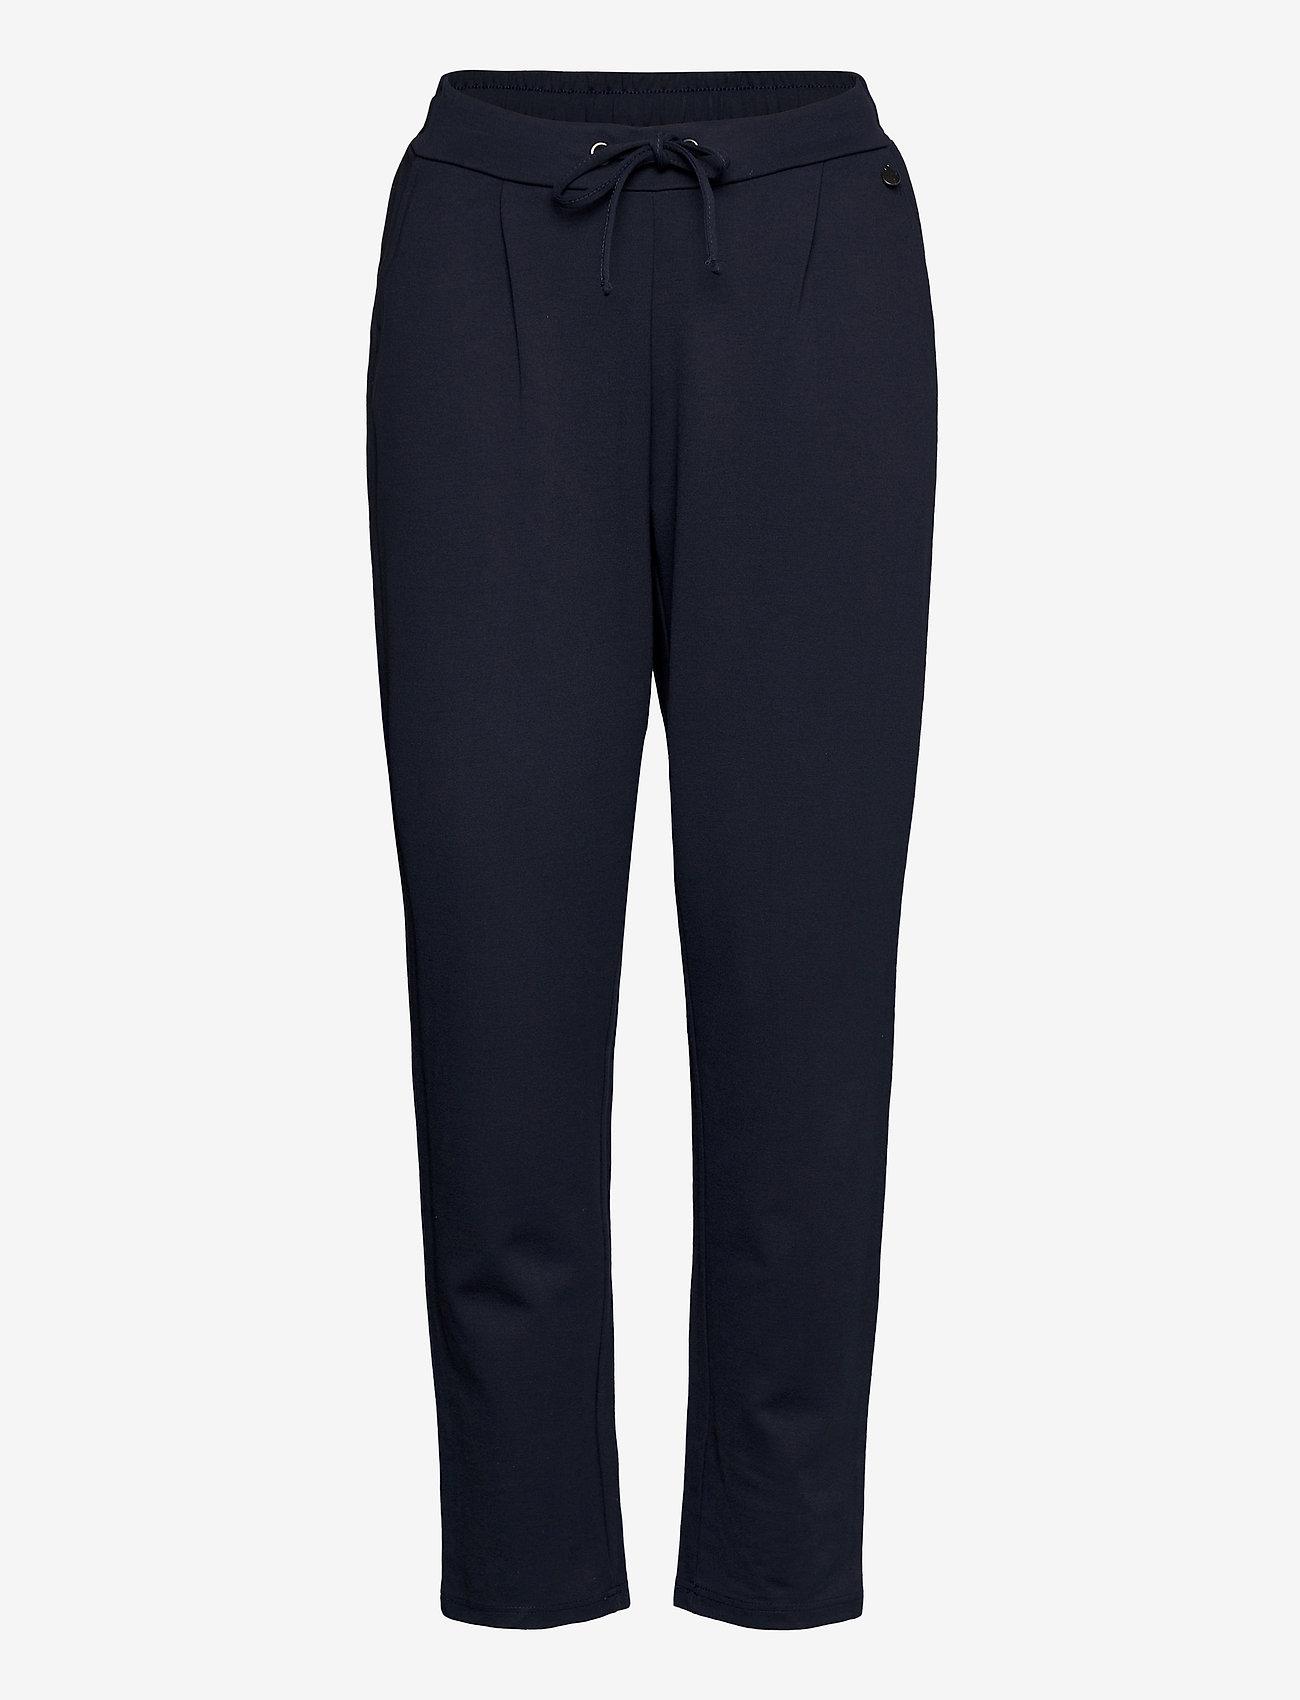 Fransa - FRZASTRETCH 1 Pants - casual broeken - dark peacoat - 0